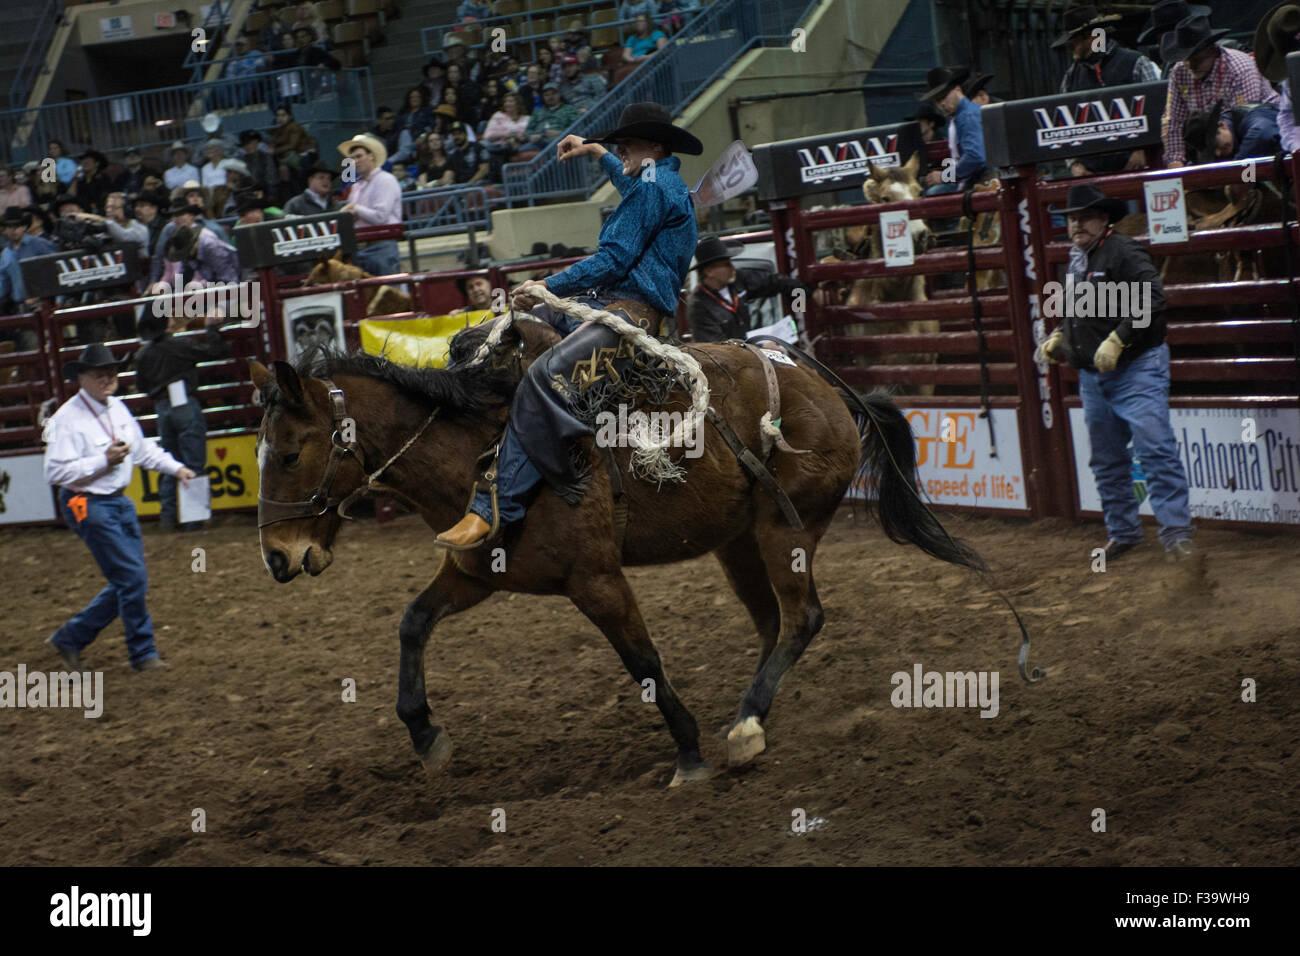 Cowboy Riding Bucking Horse During Rodeo In Oklahoma City Oklahoma Stock Photo Alamy